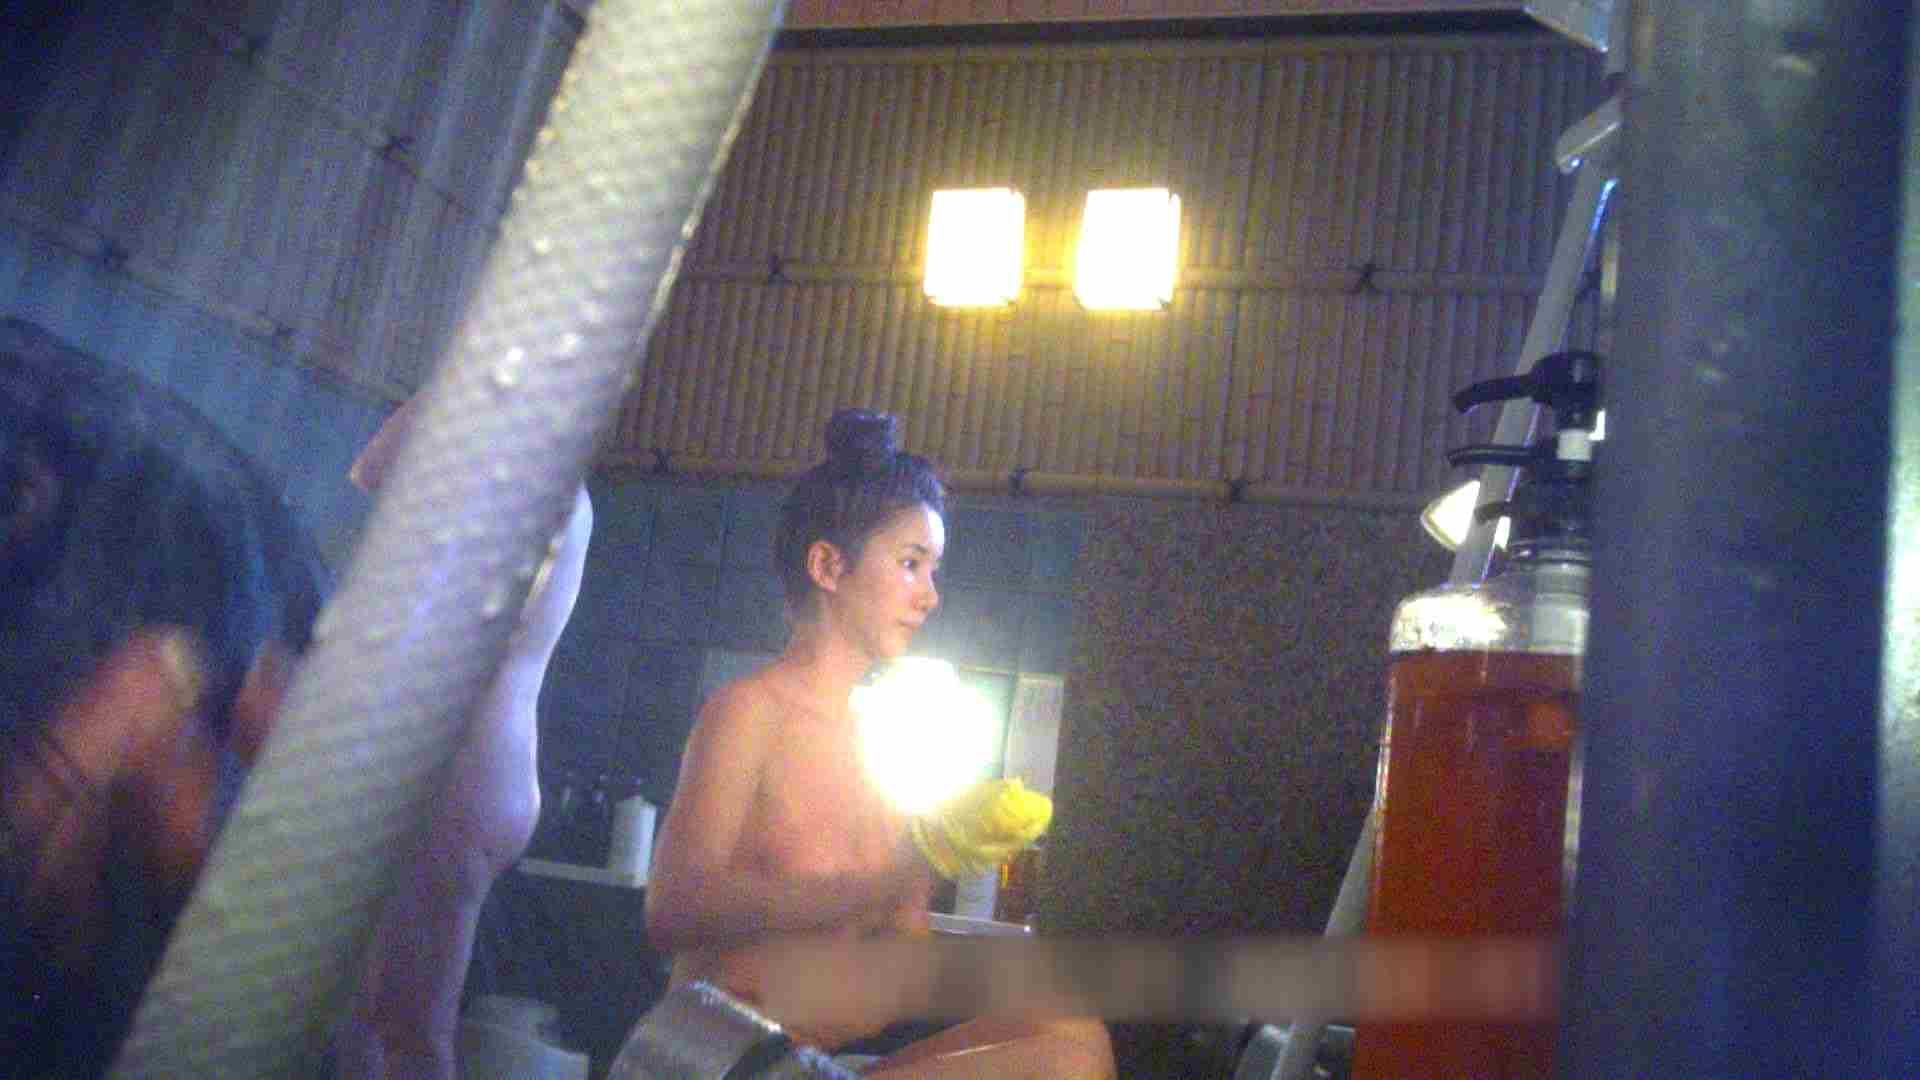 TG.15 【上等兵】高級旅館の爆乳女将で有名っぽい 潜入 おまんこ動画流出 110枚 86